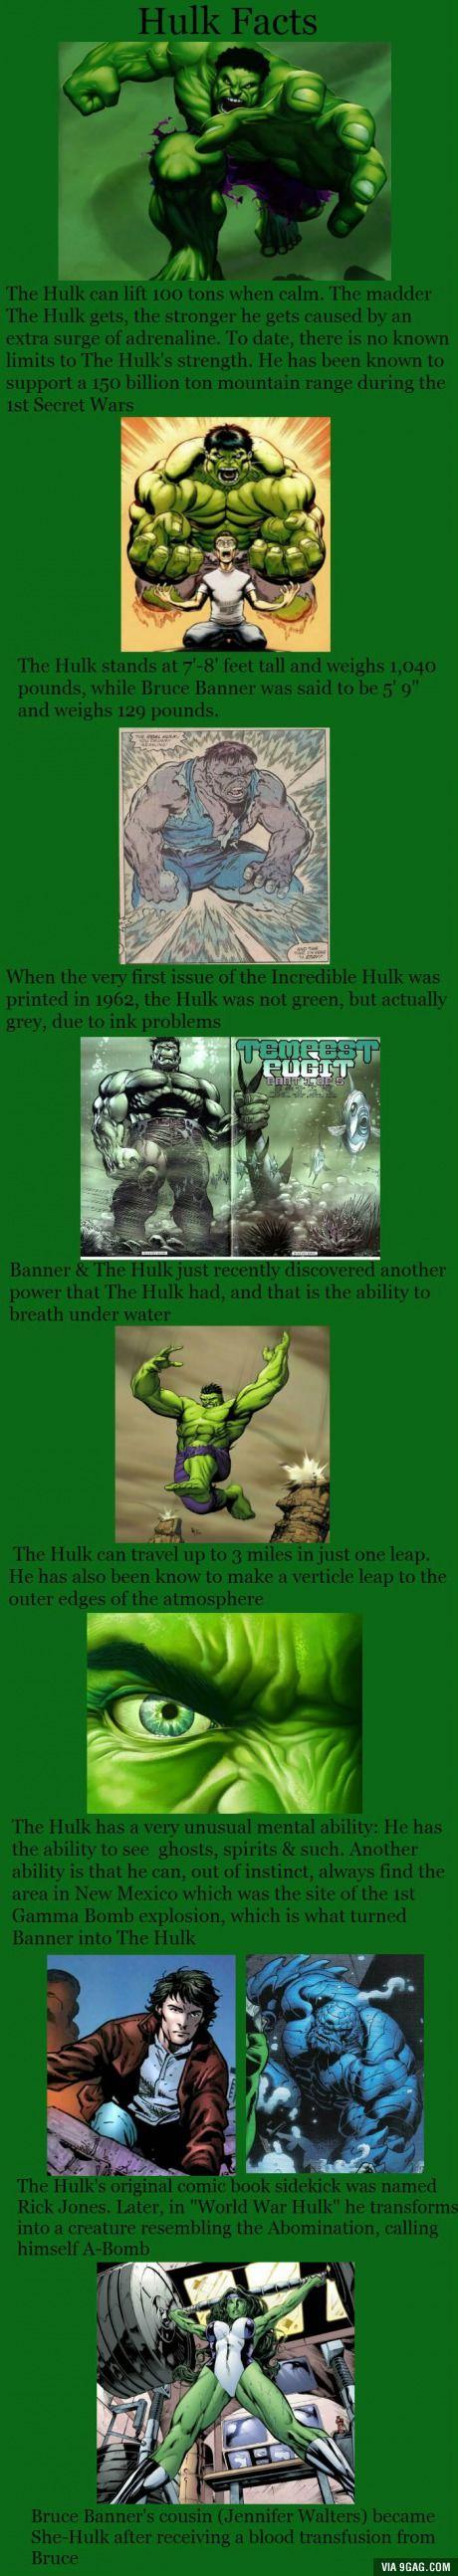 The Hulk facts